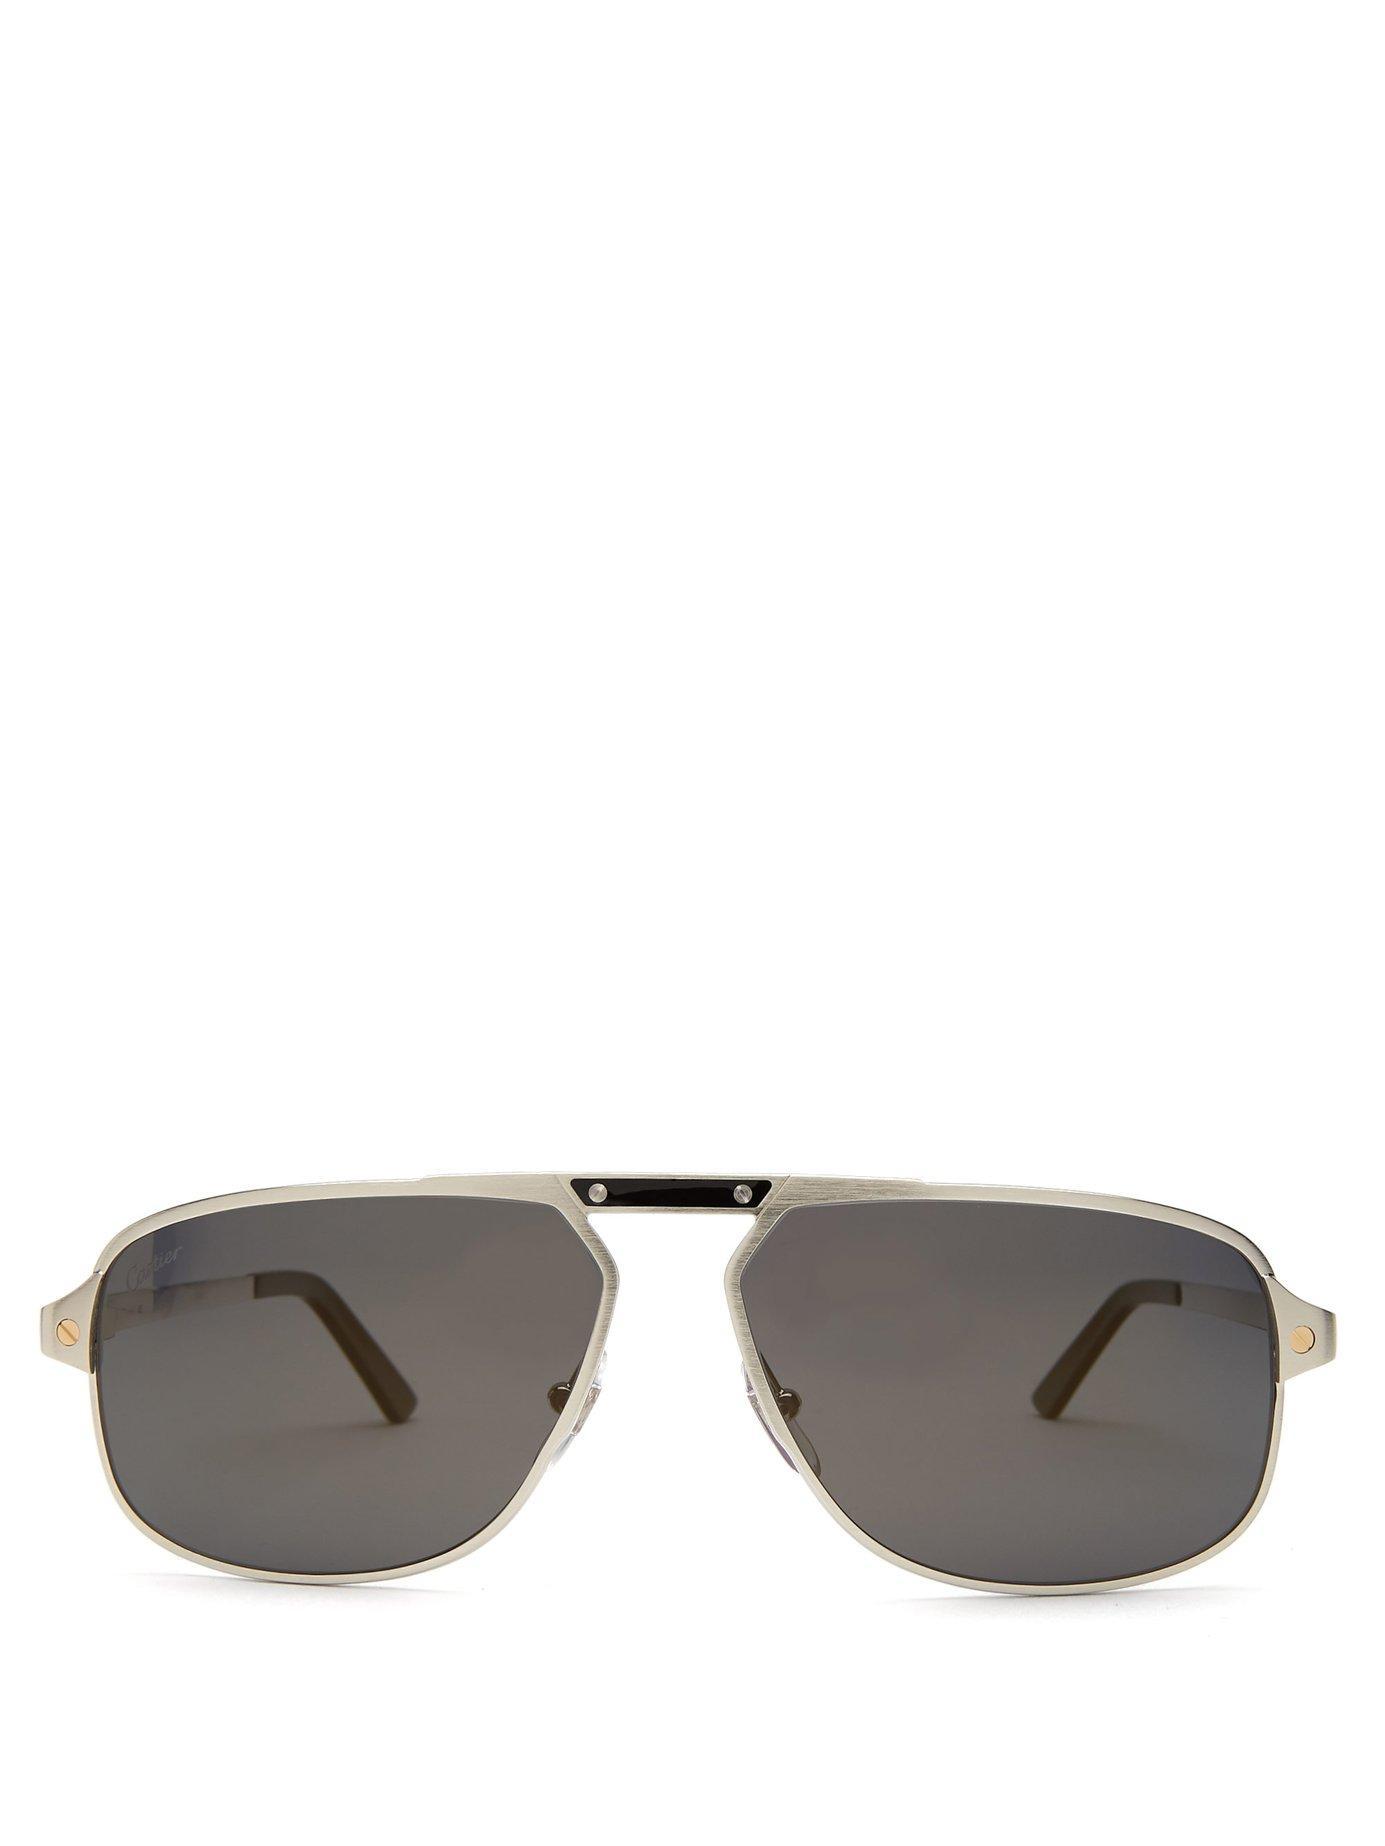 f0eb8535de Lyst - Cartier Santos De Cartier Aviator Sunglasses in Metallic for Men